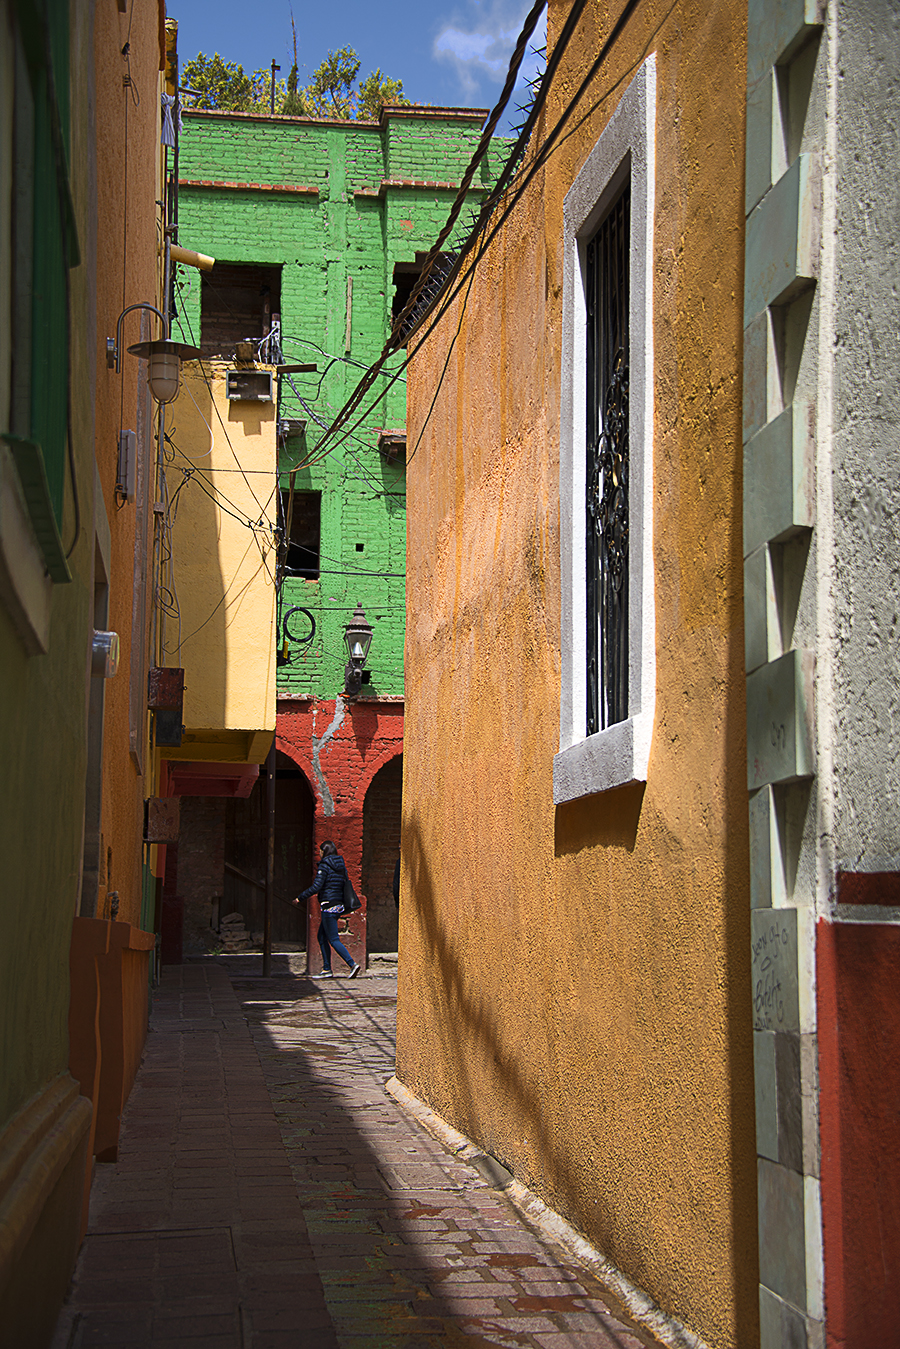 ZoeYunZou_Photography_Guanajuato_Mexico_2016_StraightUp_ColorAndShadow